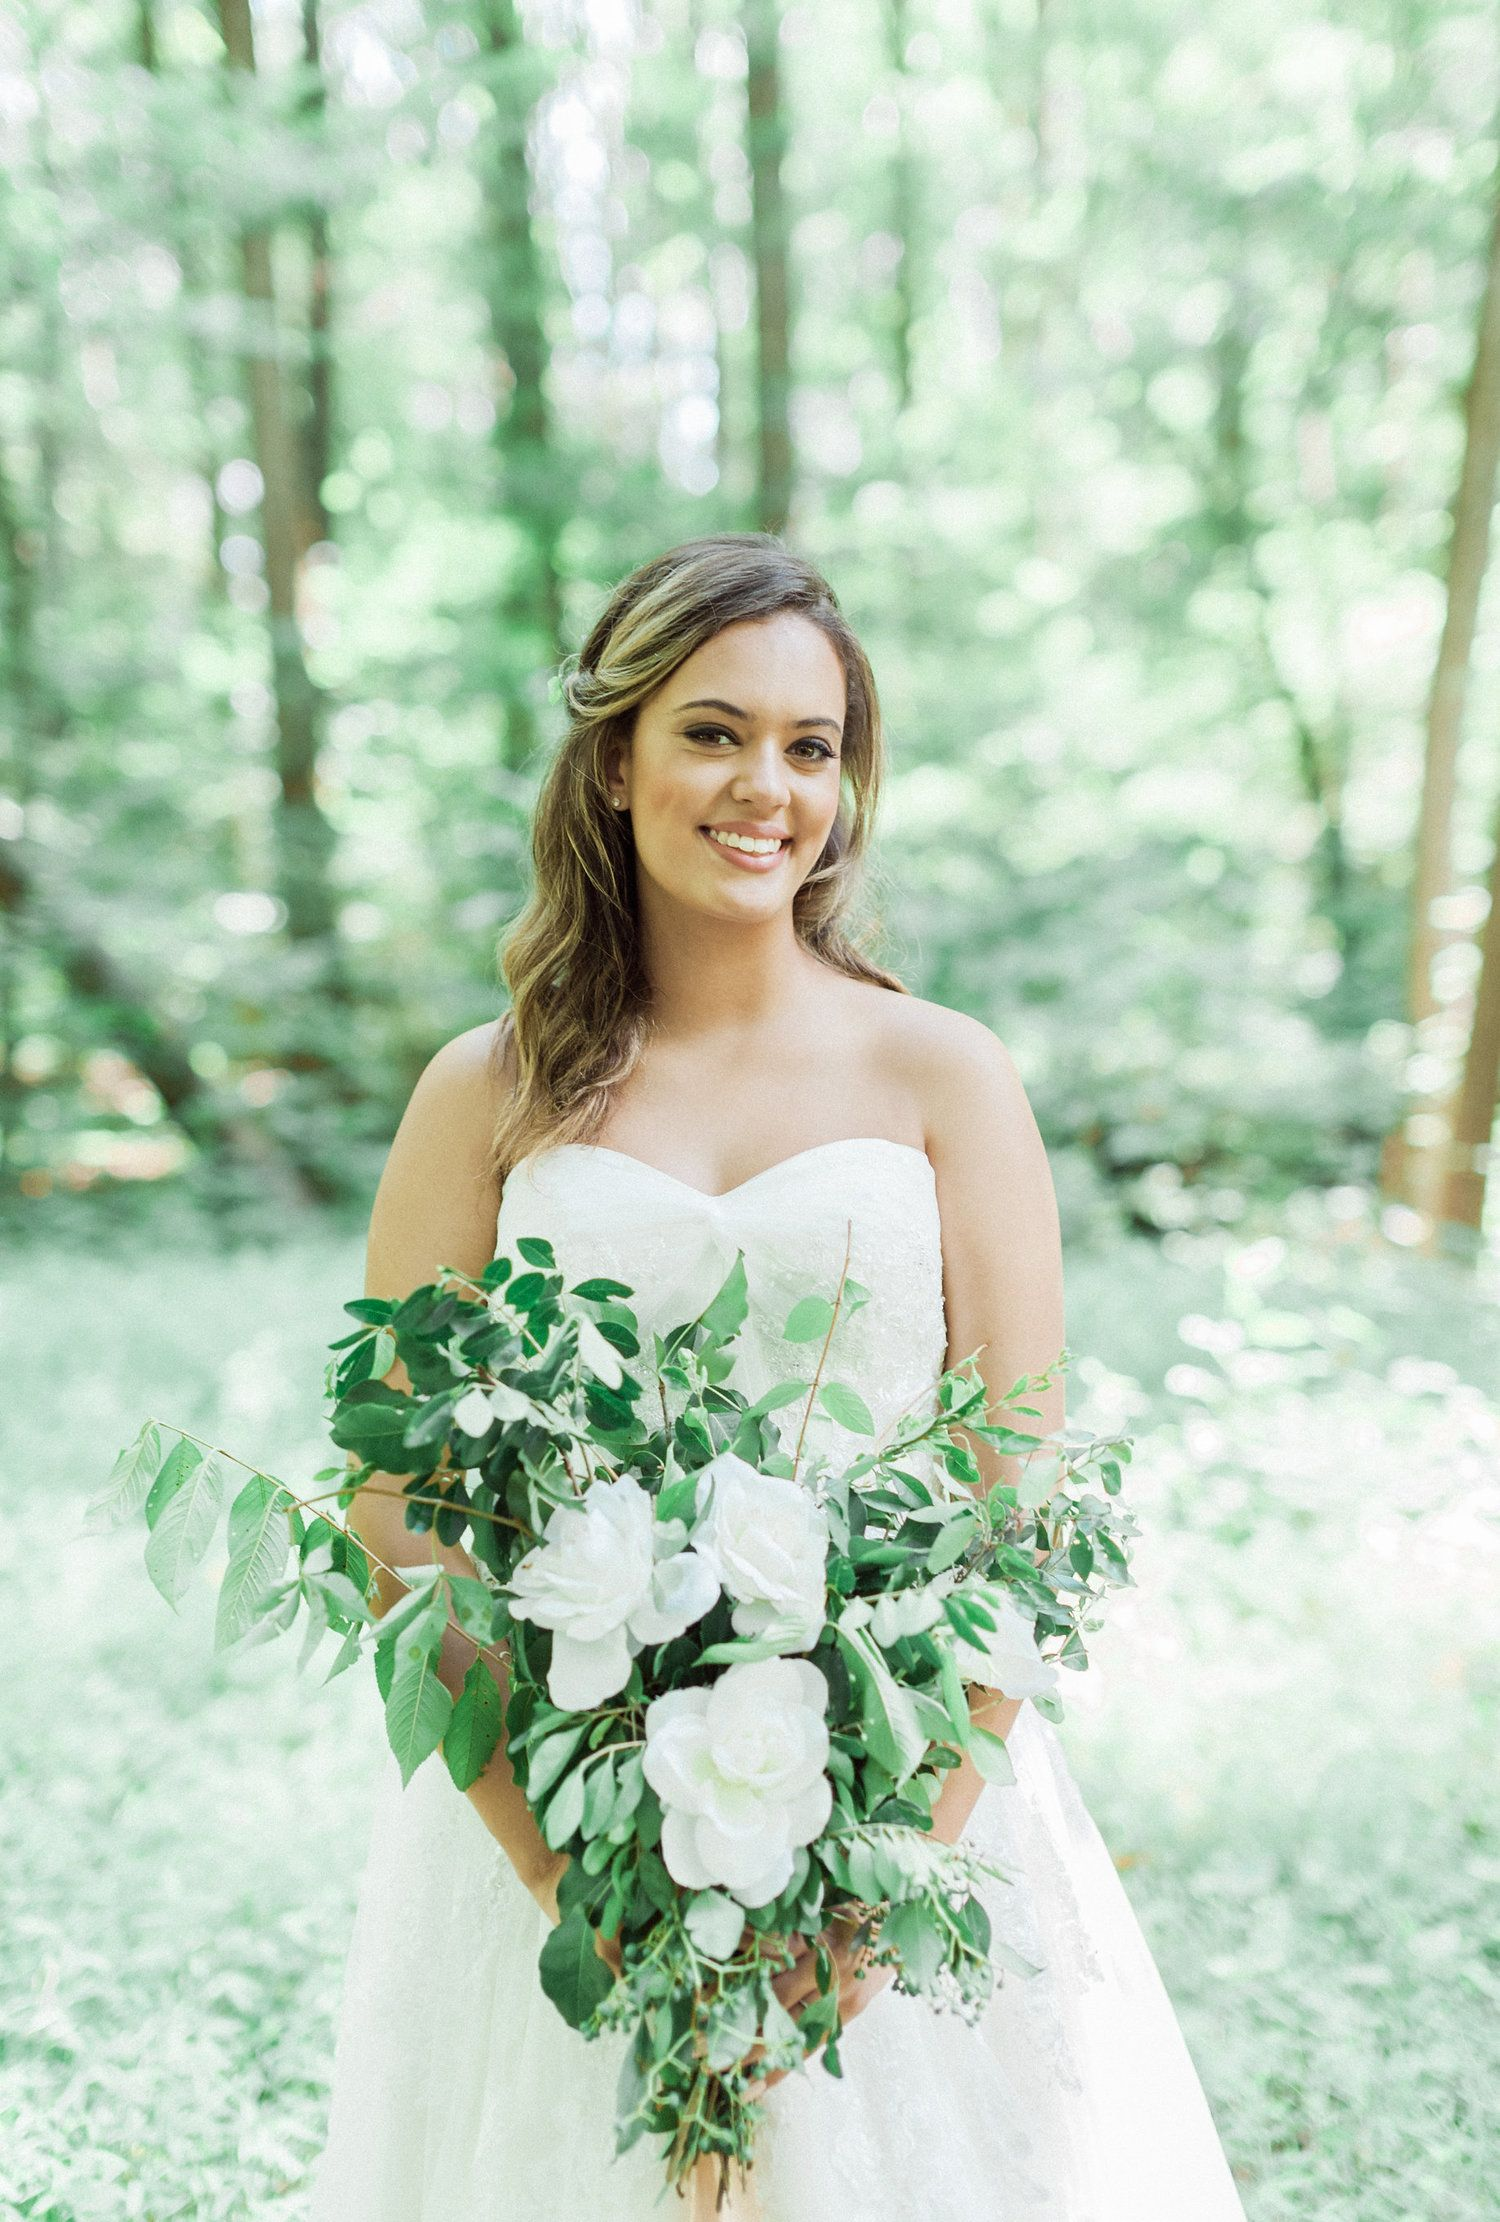 Atlanta, GA bridal makeup and hair, soft and feminine